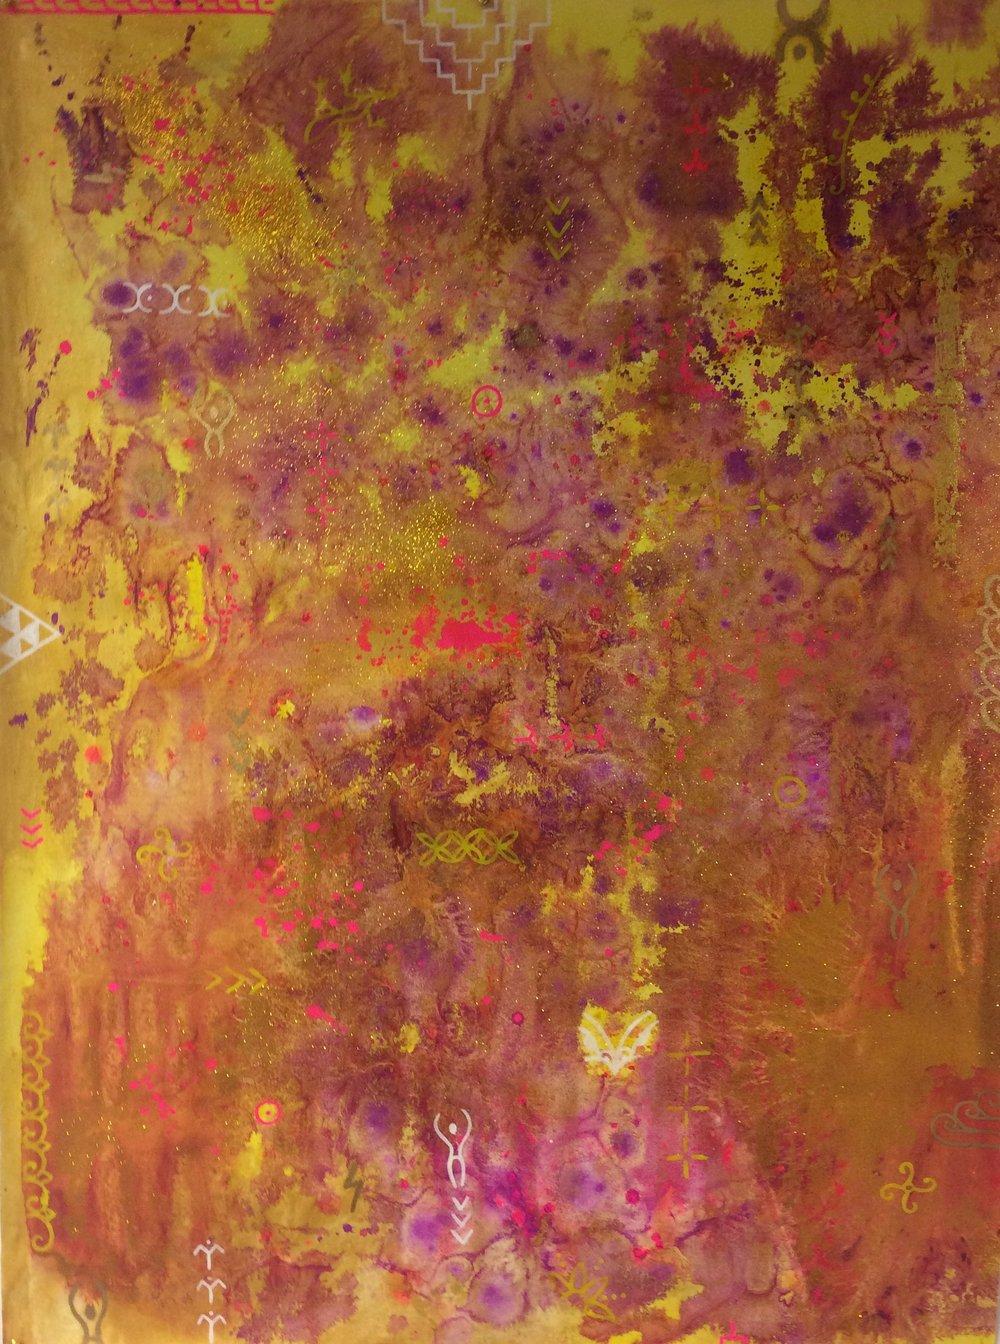 'All one under the sun' by Taryn Beri.